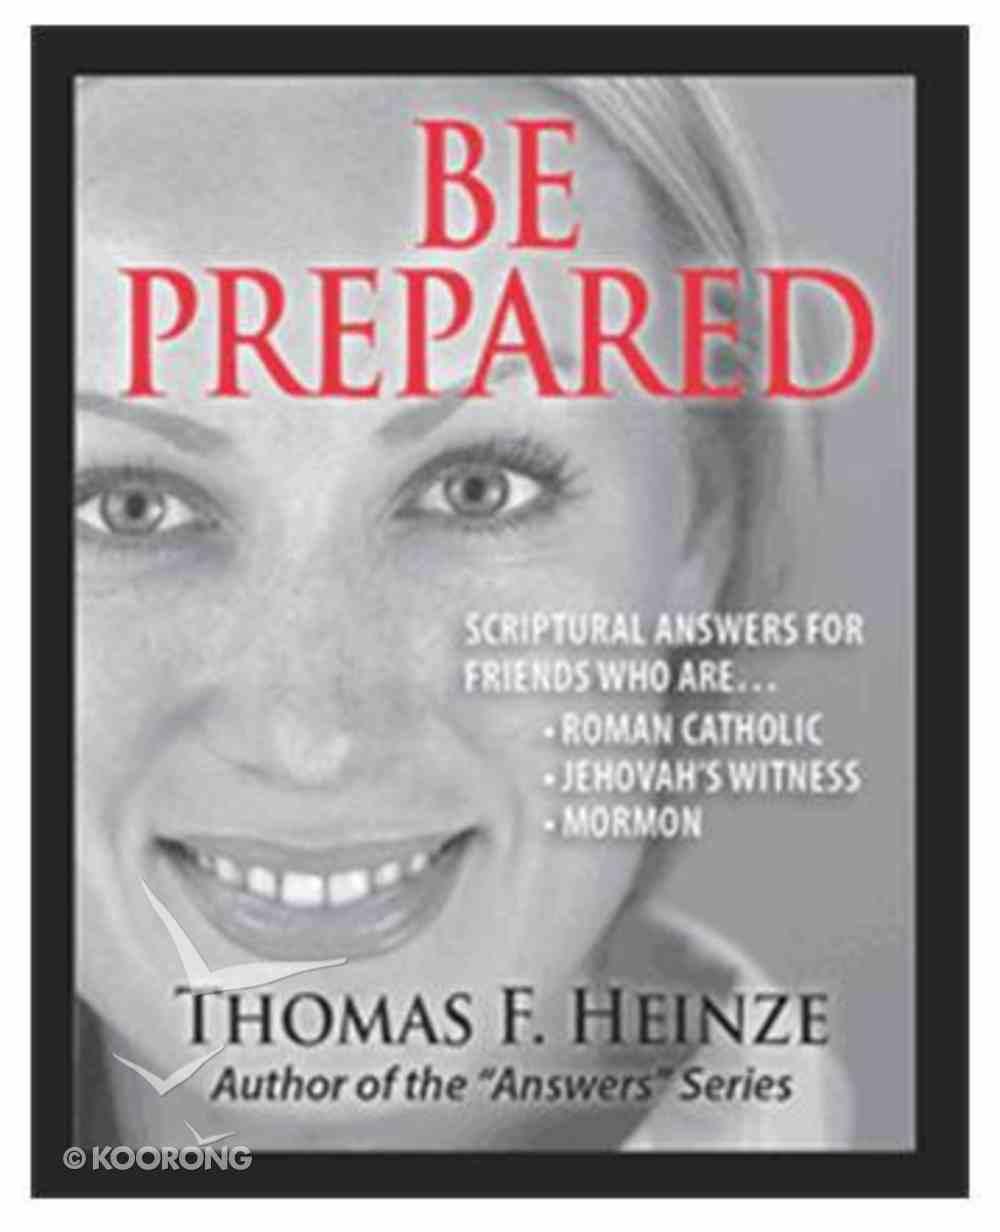 Be Prepared Booklet